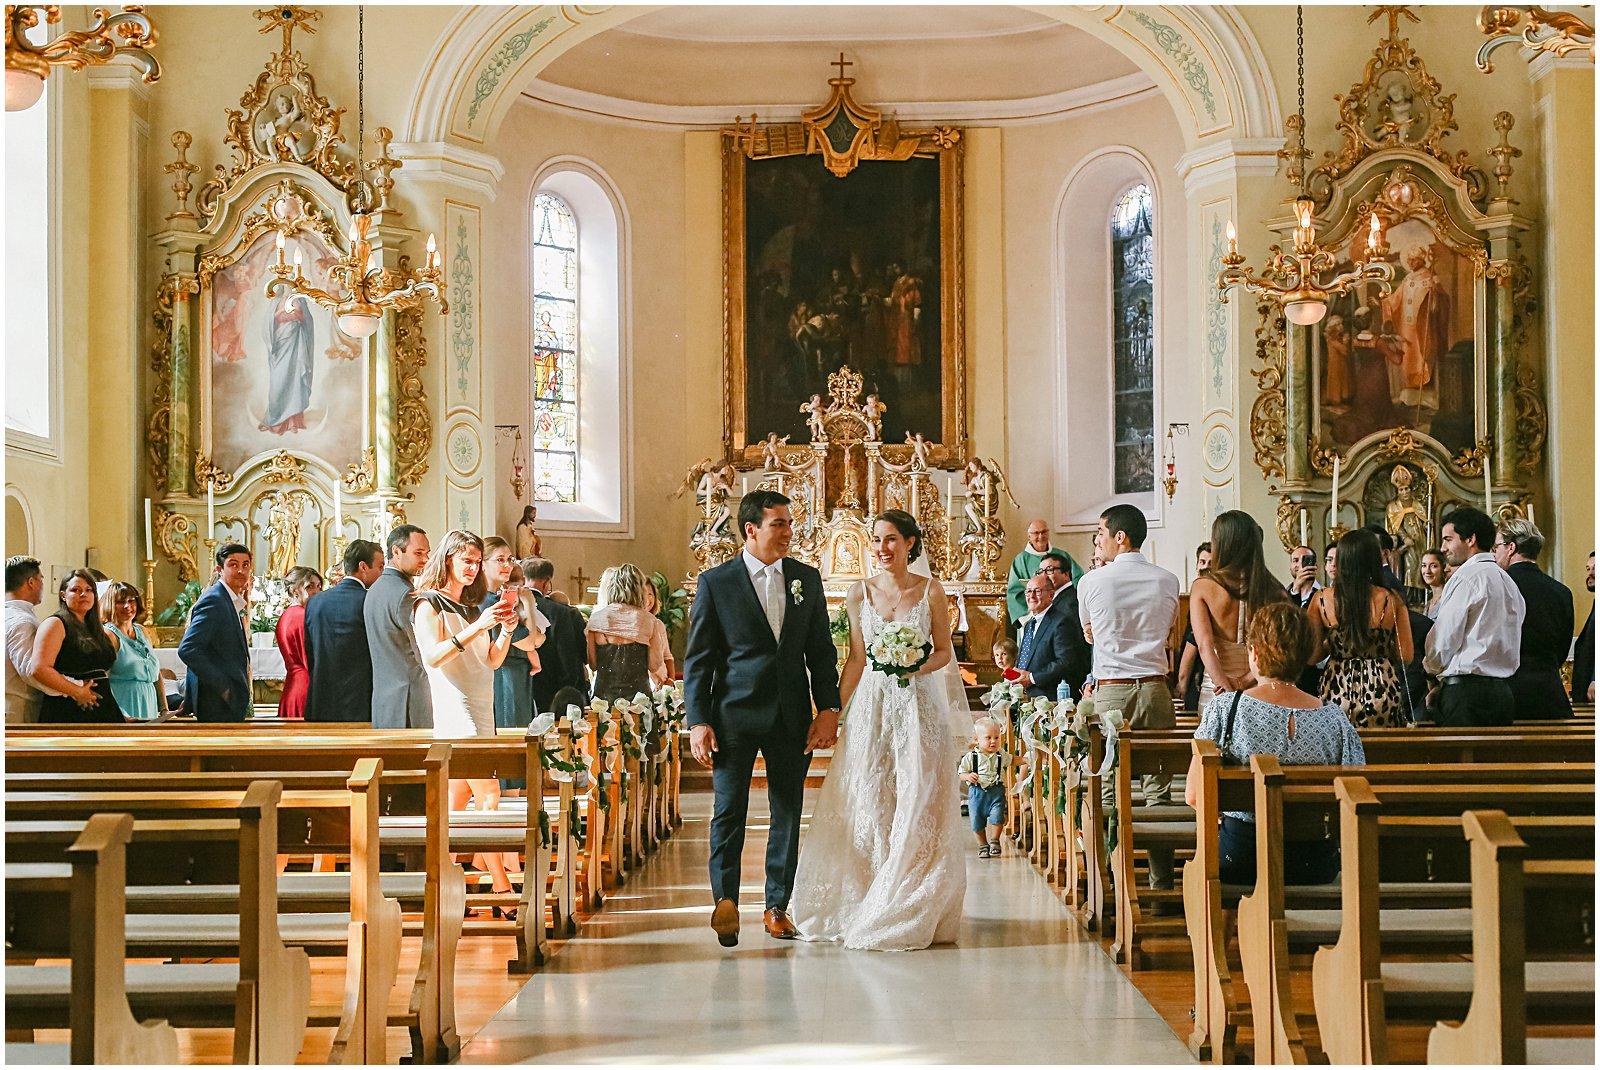 watwiller church wedding Alsace France photographer Helena Woods